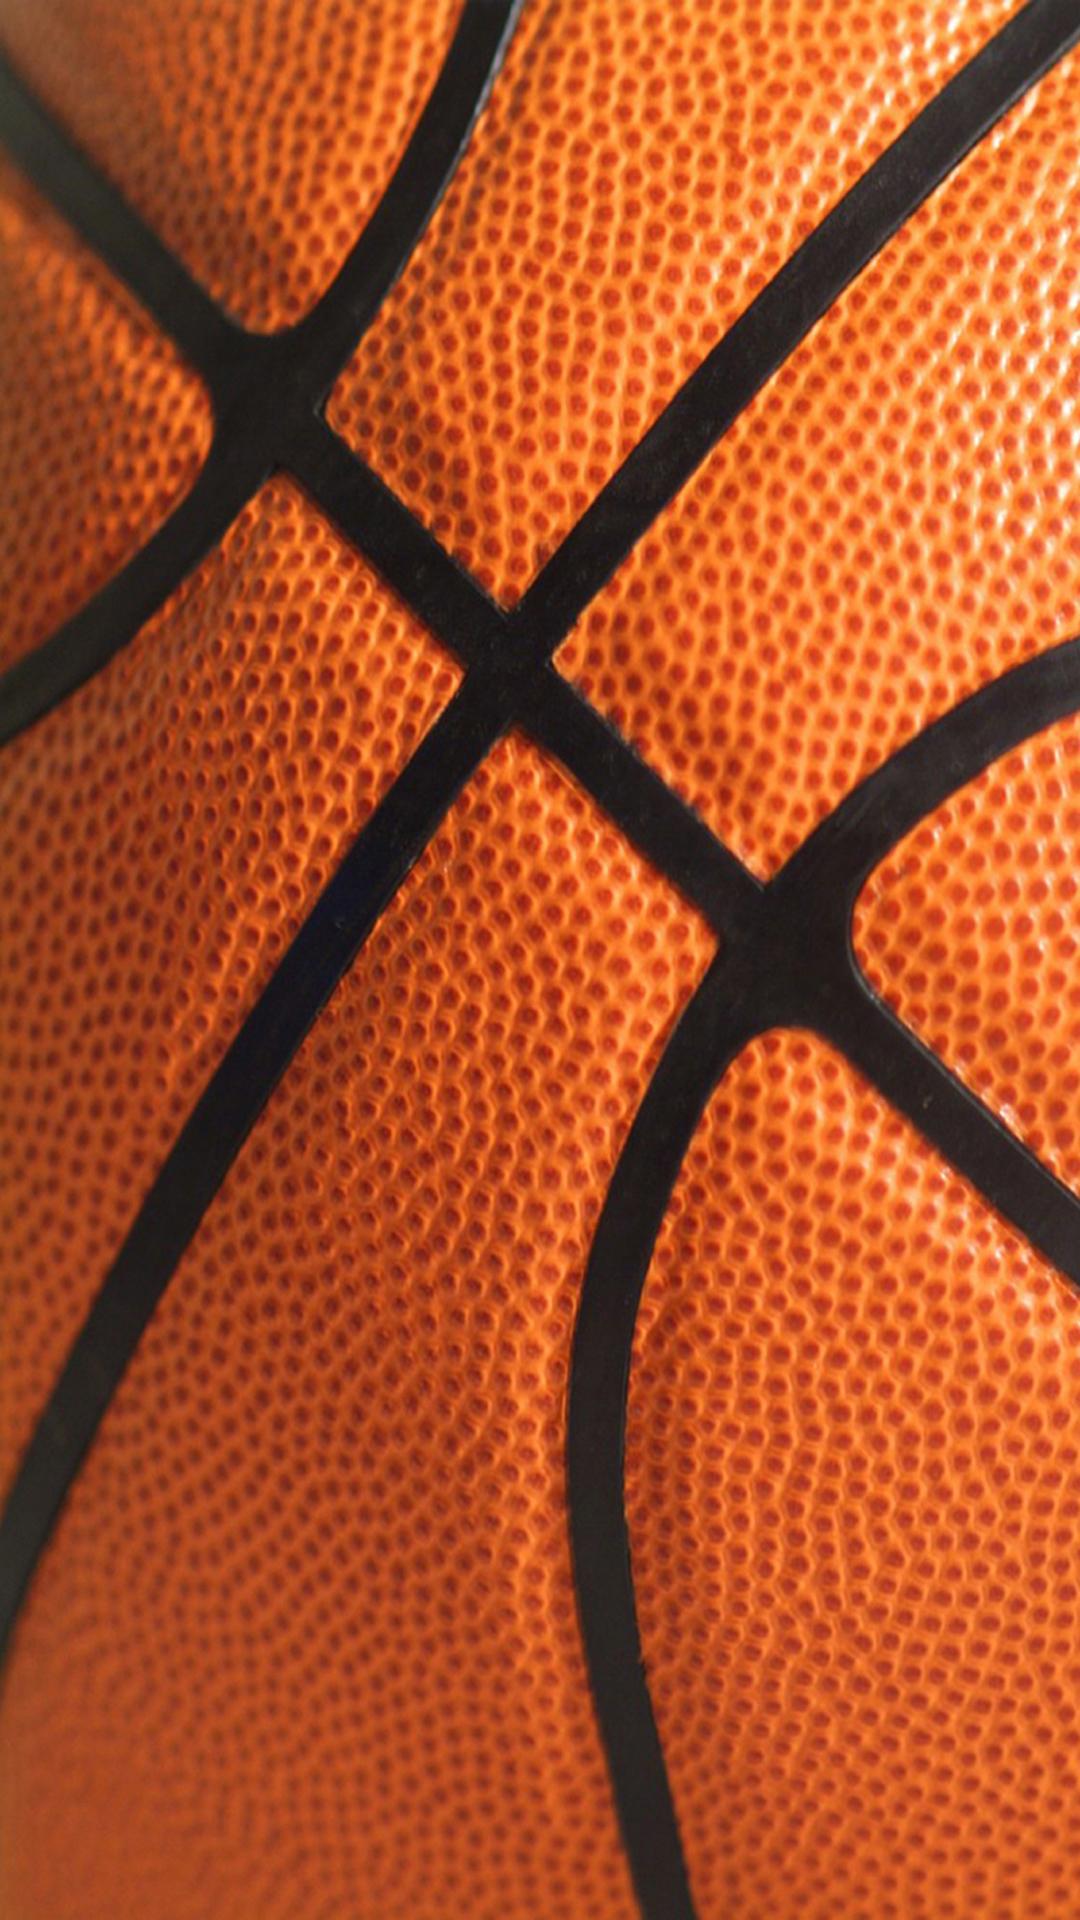 Iphone 6sのバスケットボールの壁紙 スポーツの壁紙 1080x19 Wallpapertip